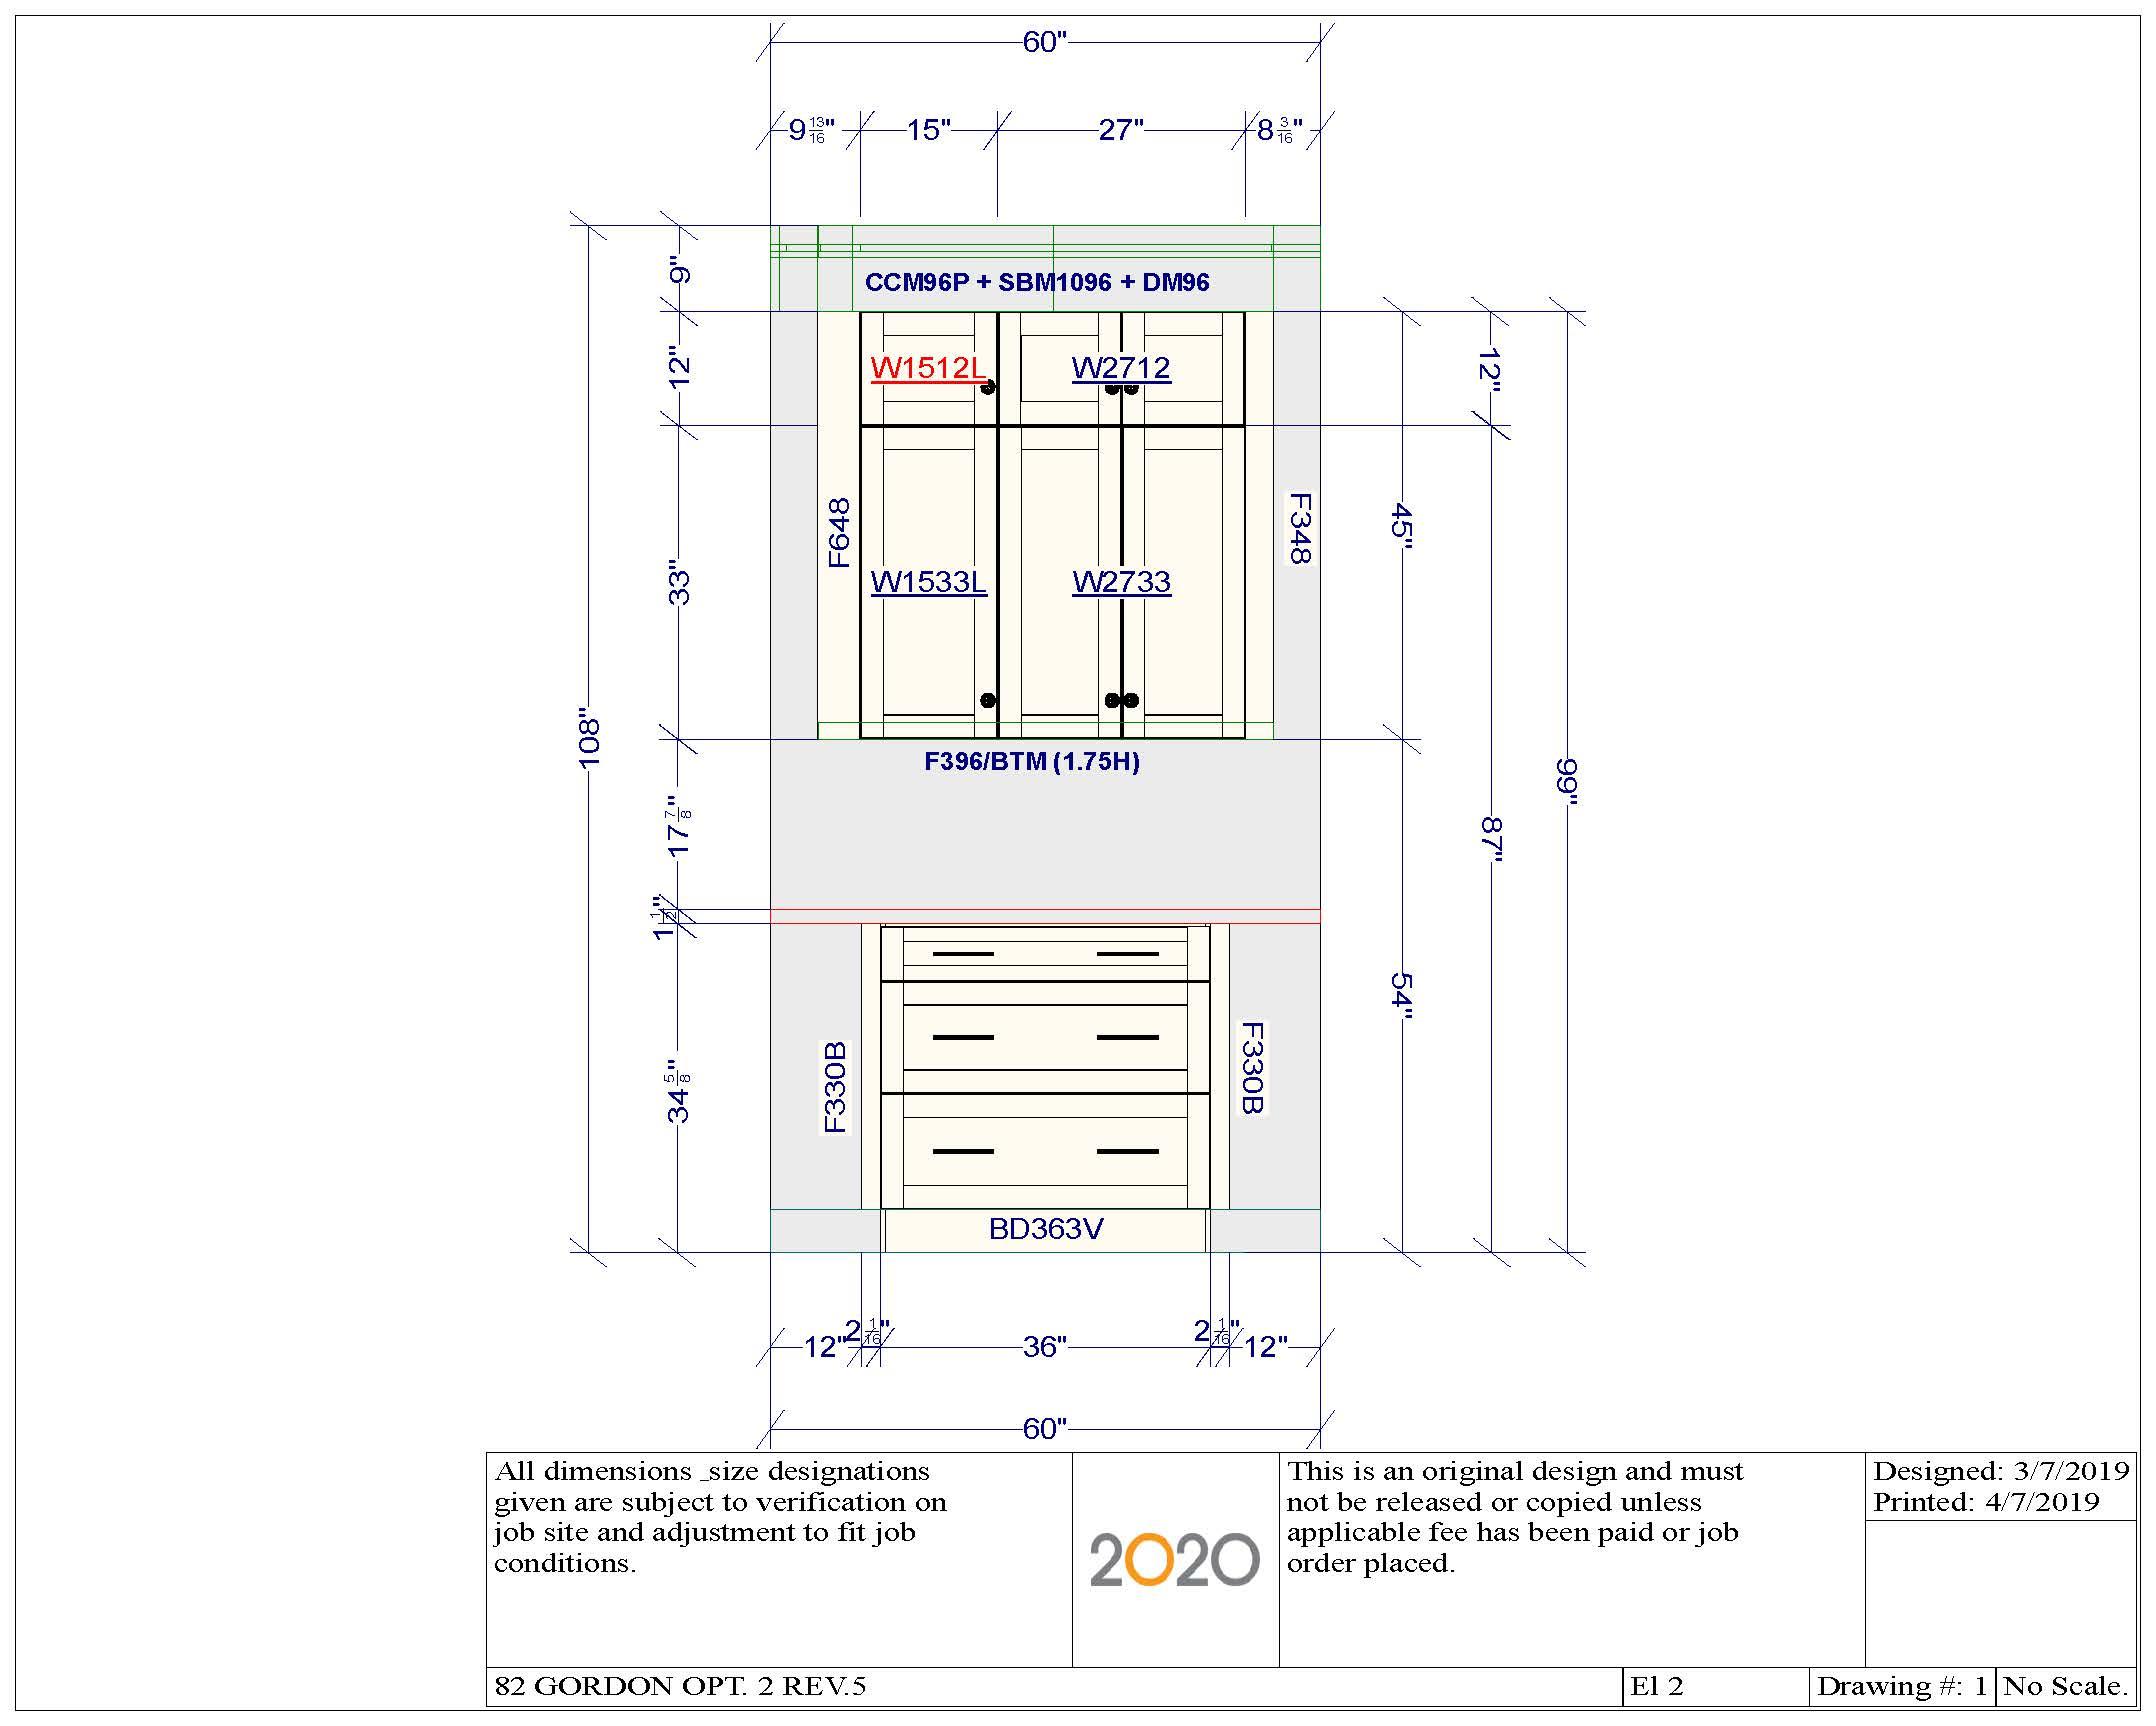 82 GORDON OPT. 2 REV.5-11_Page_07